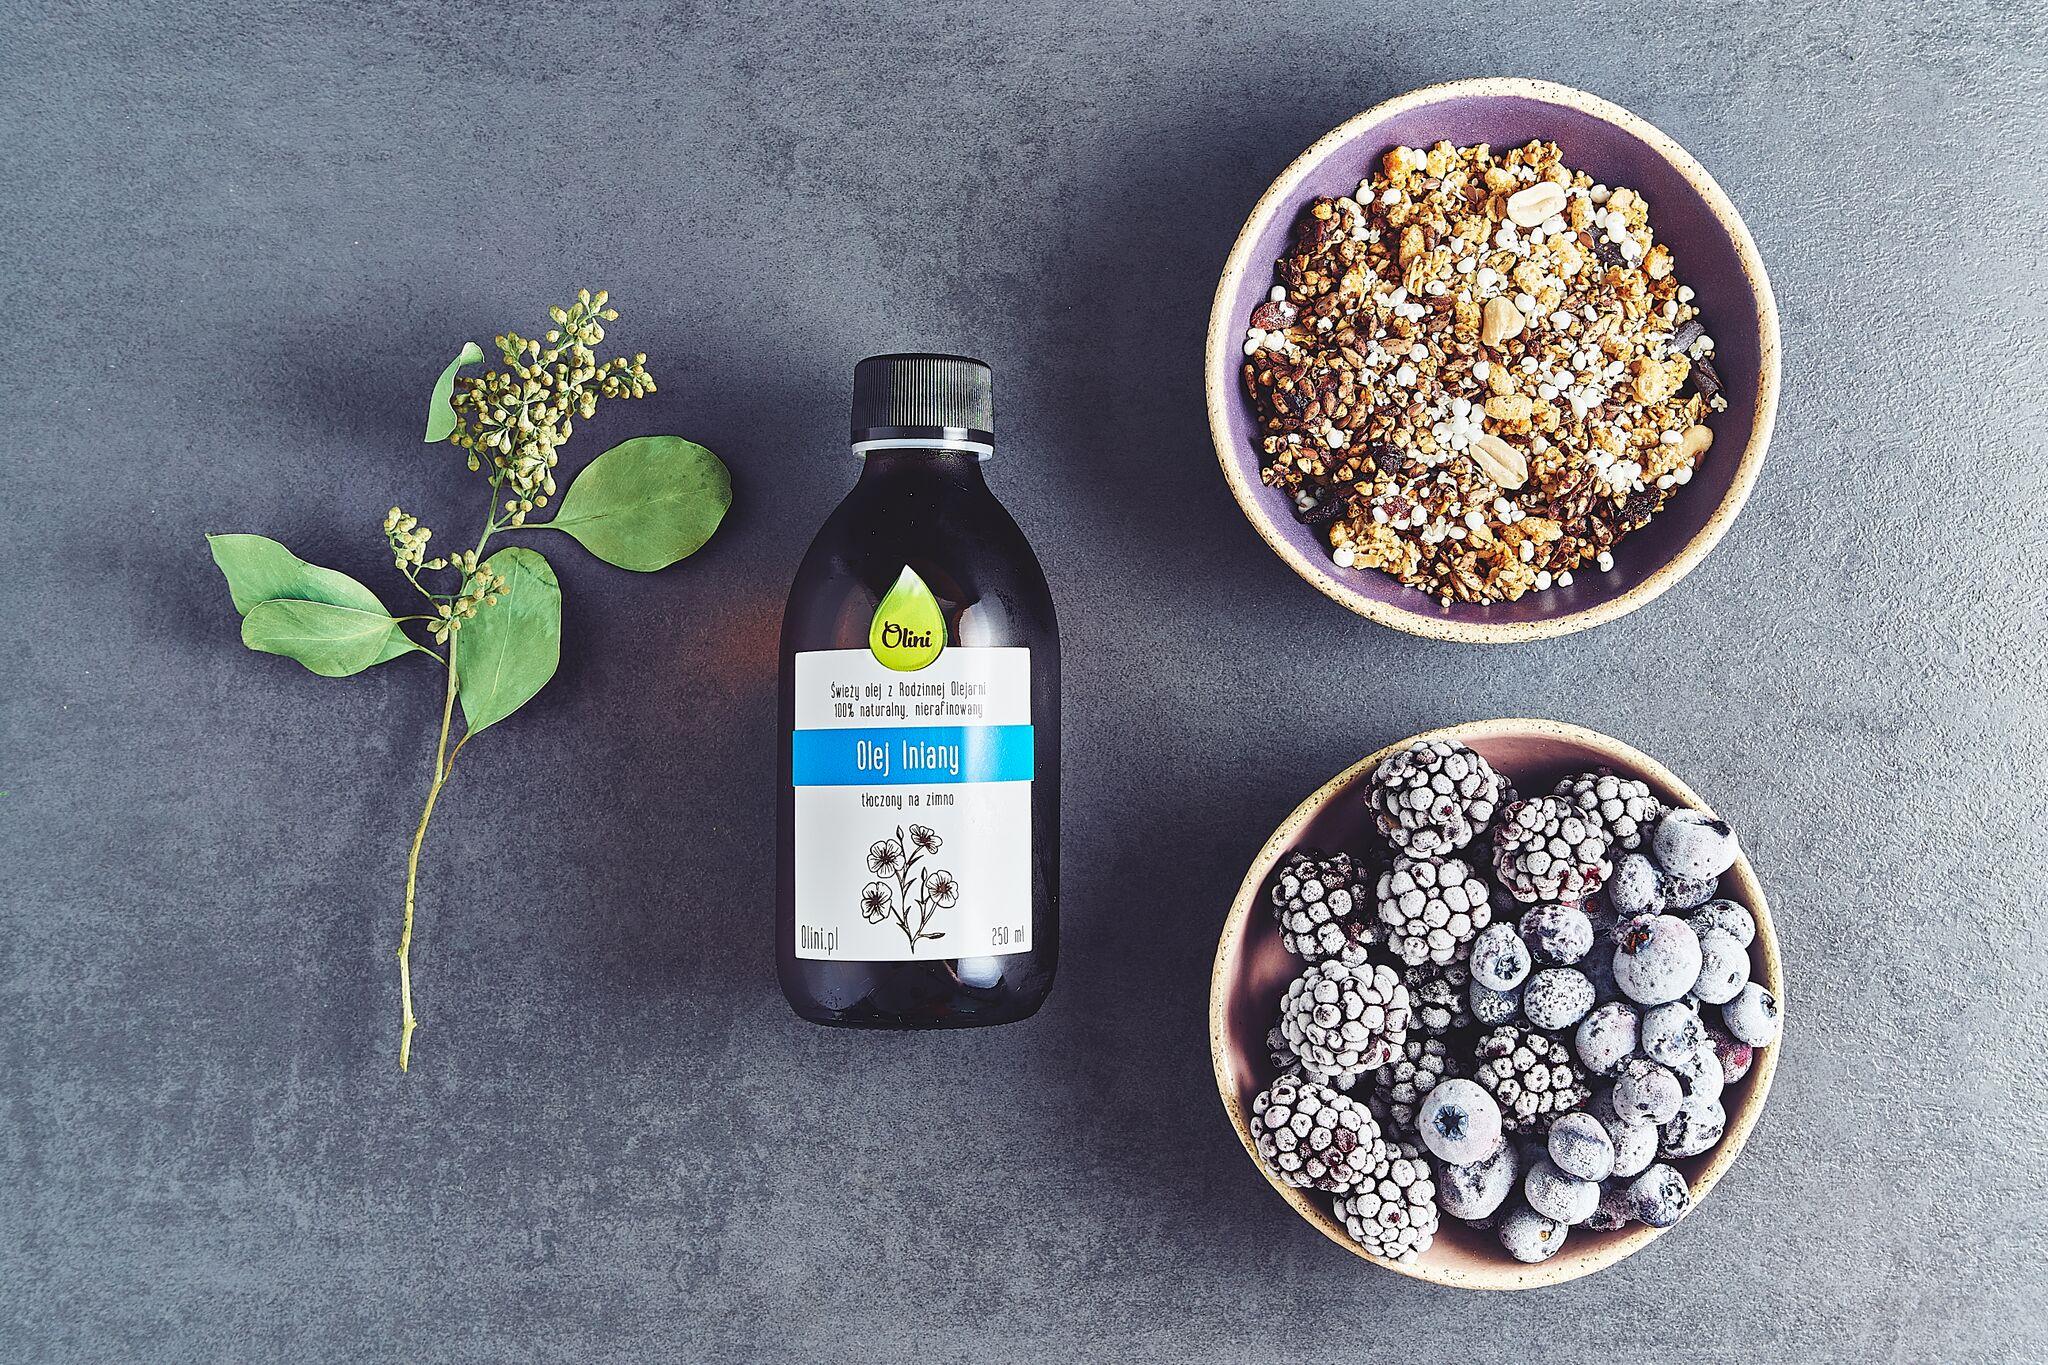 Owoce, musli i olej